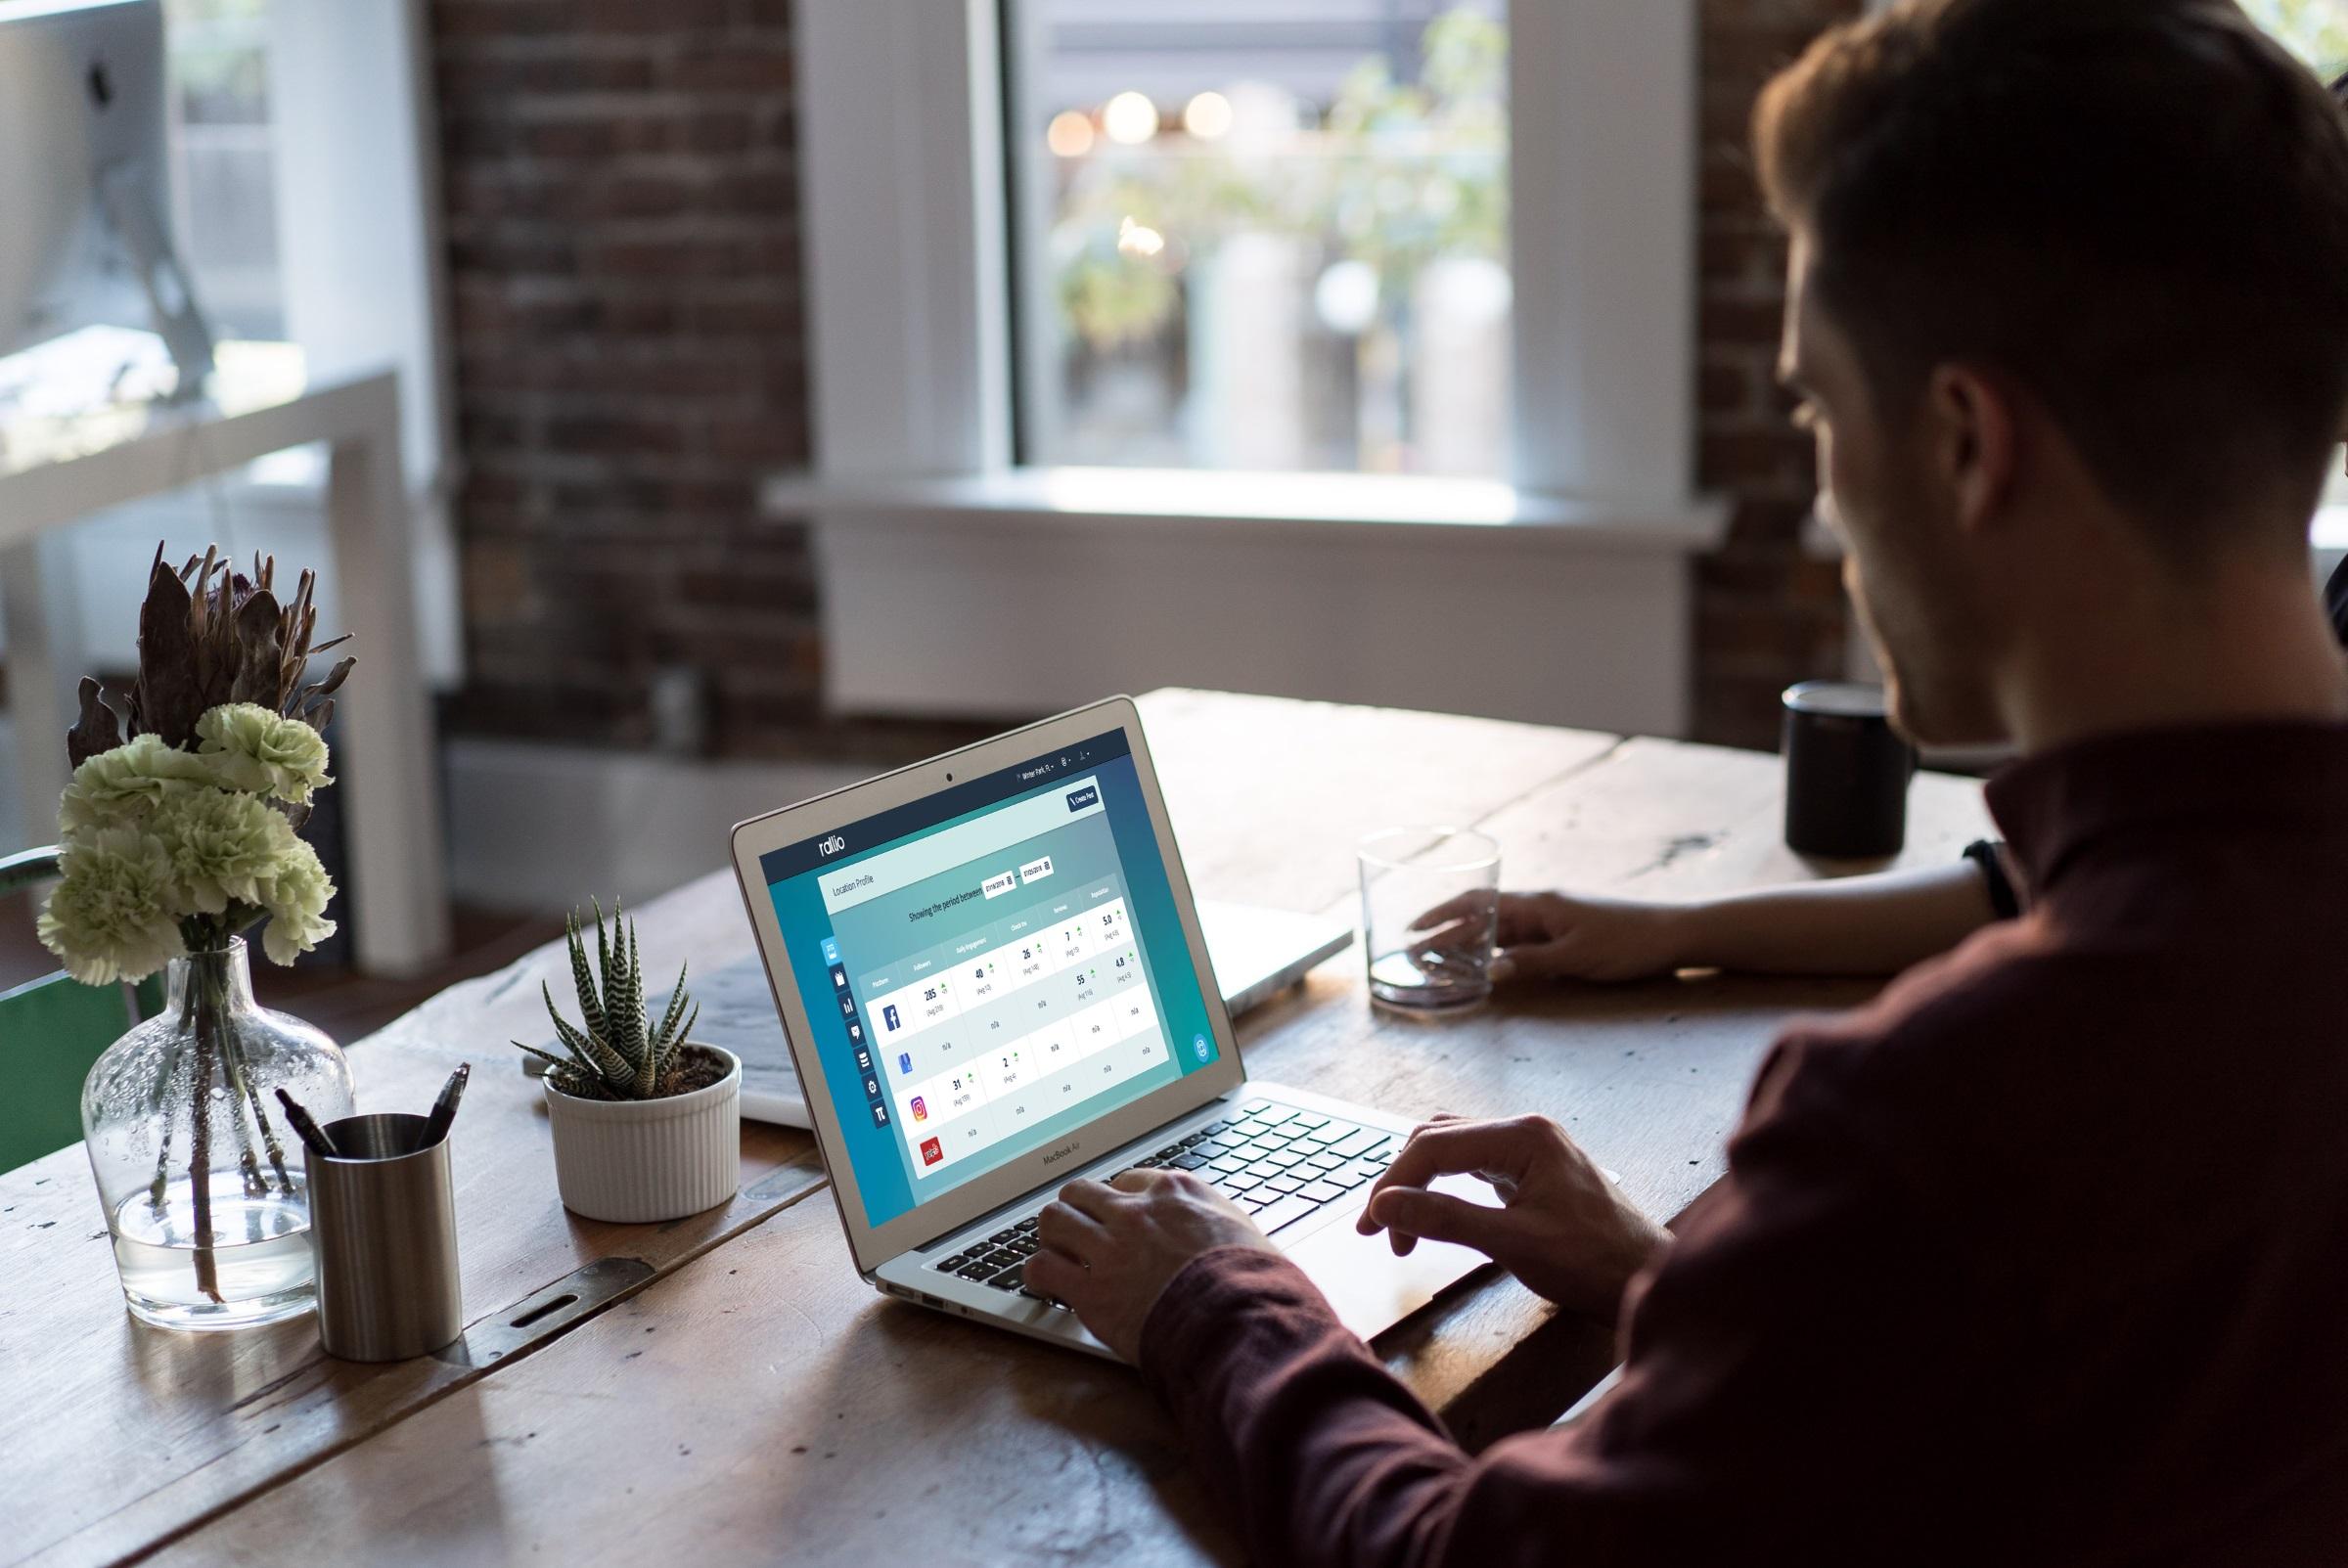 Yokohama Announces New Rallio Social Media Tool for Dealers